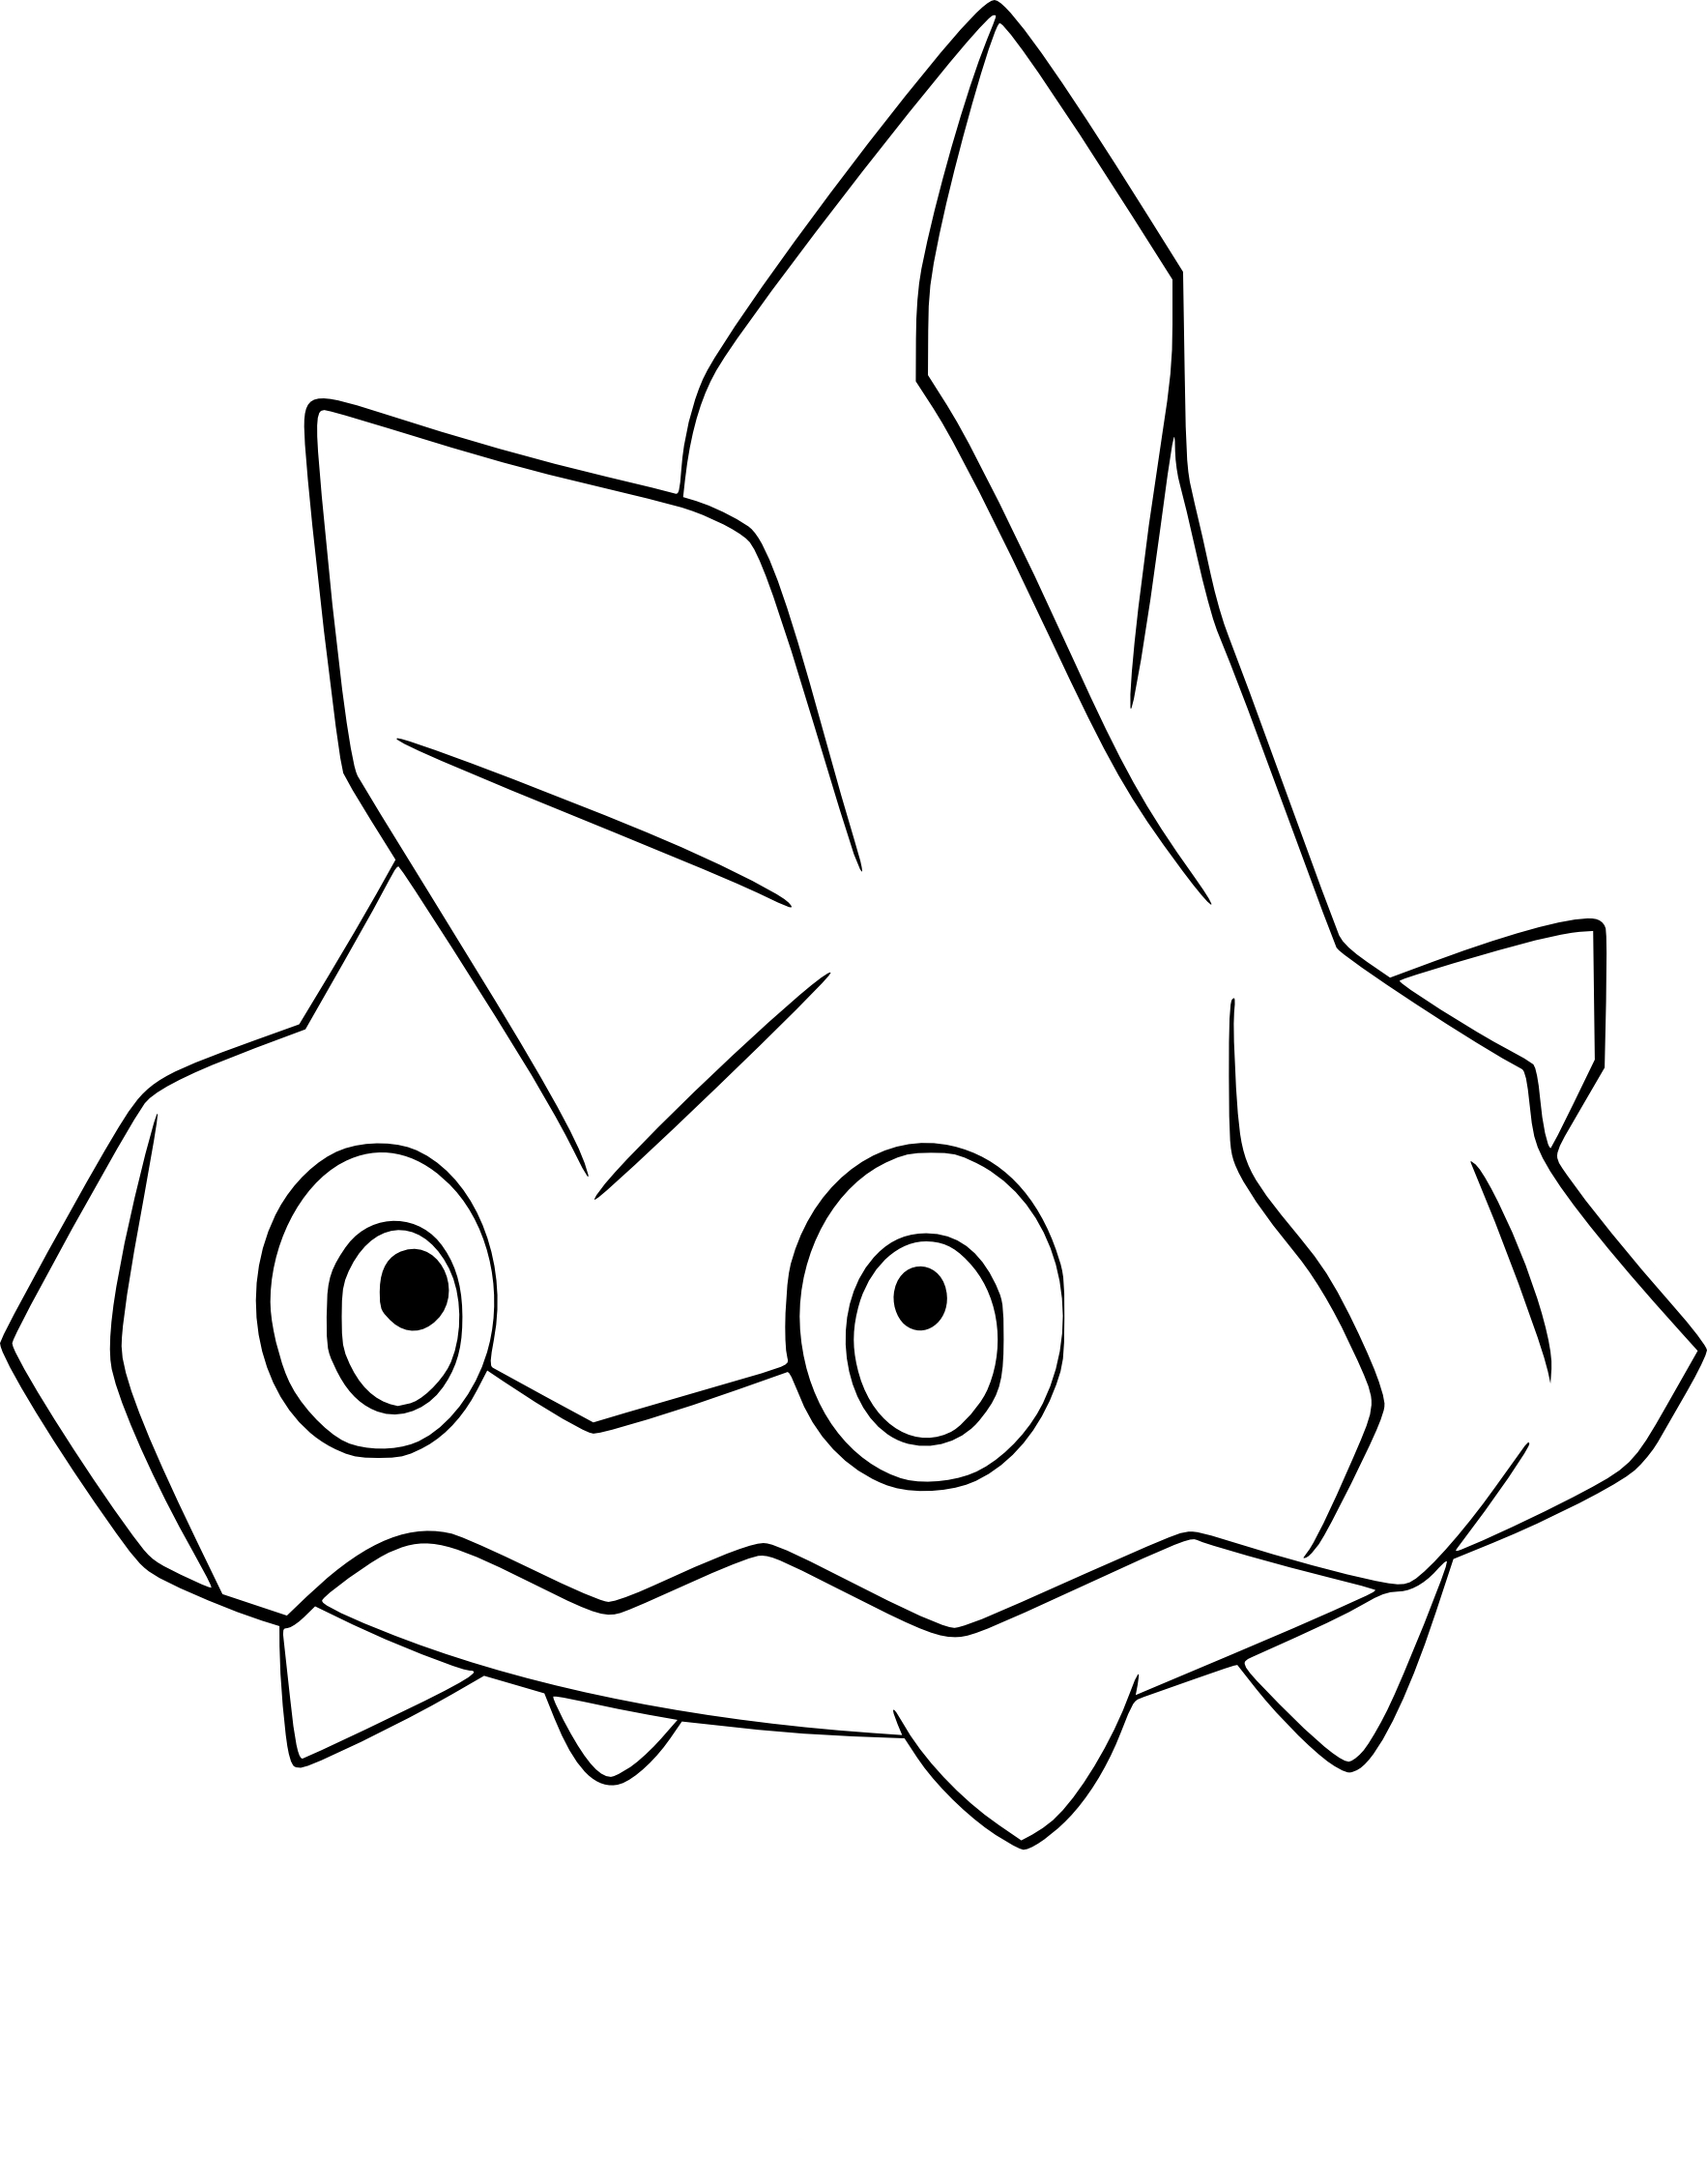 Coloriage Vorasterie Pokemon A Imprimer